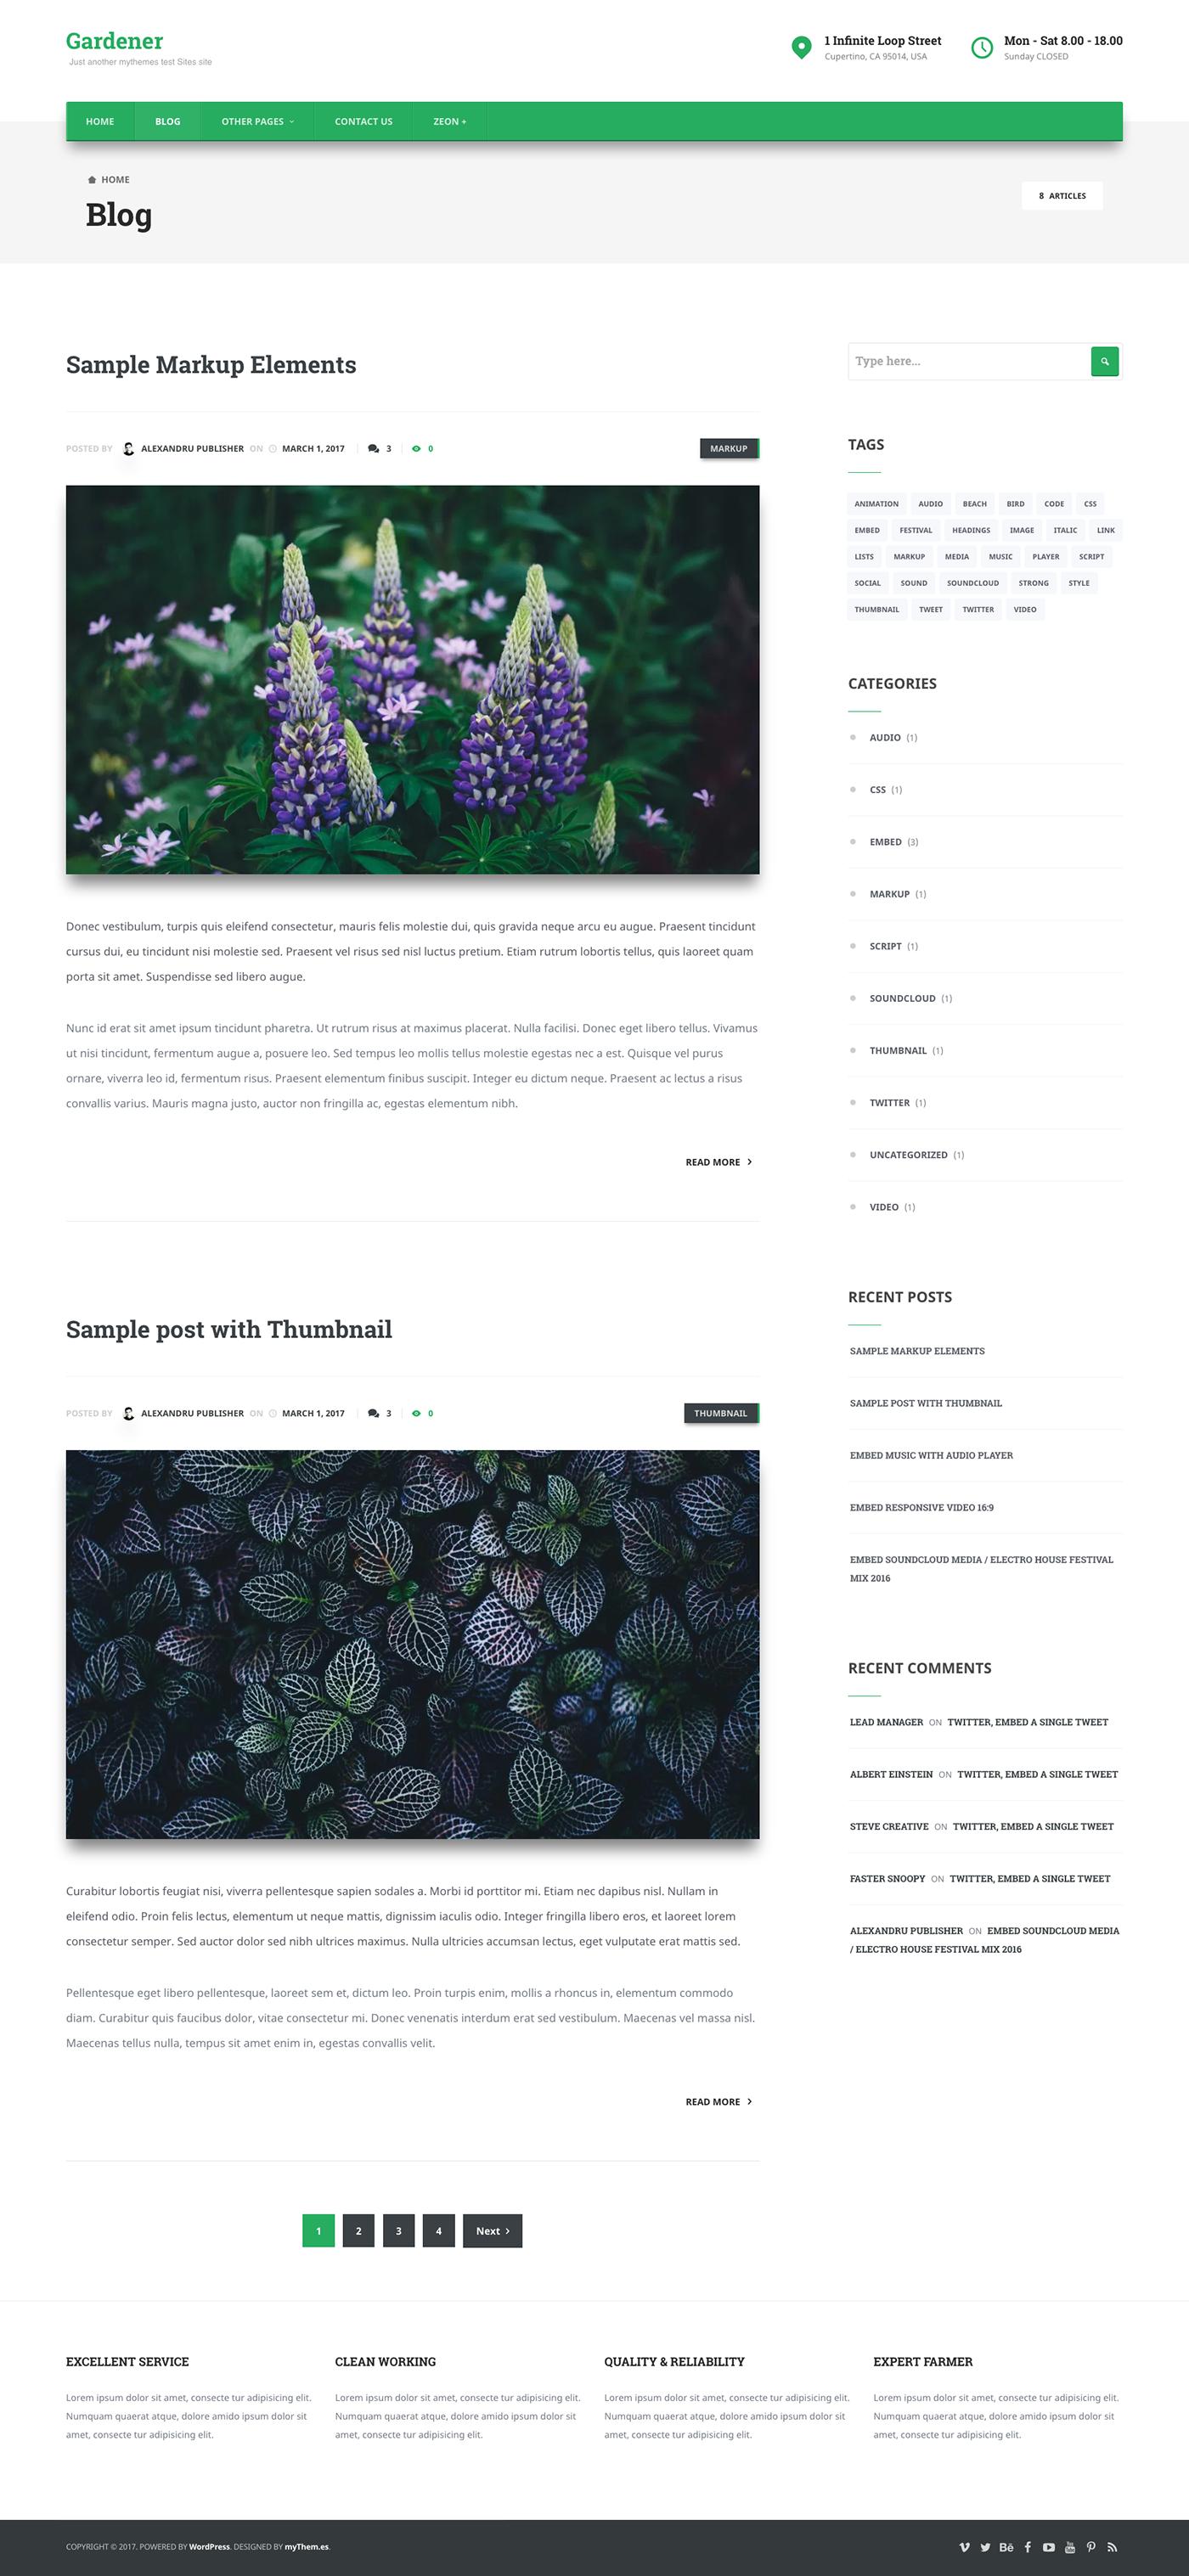 Small Business tempo child theme gardener wordpress template